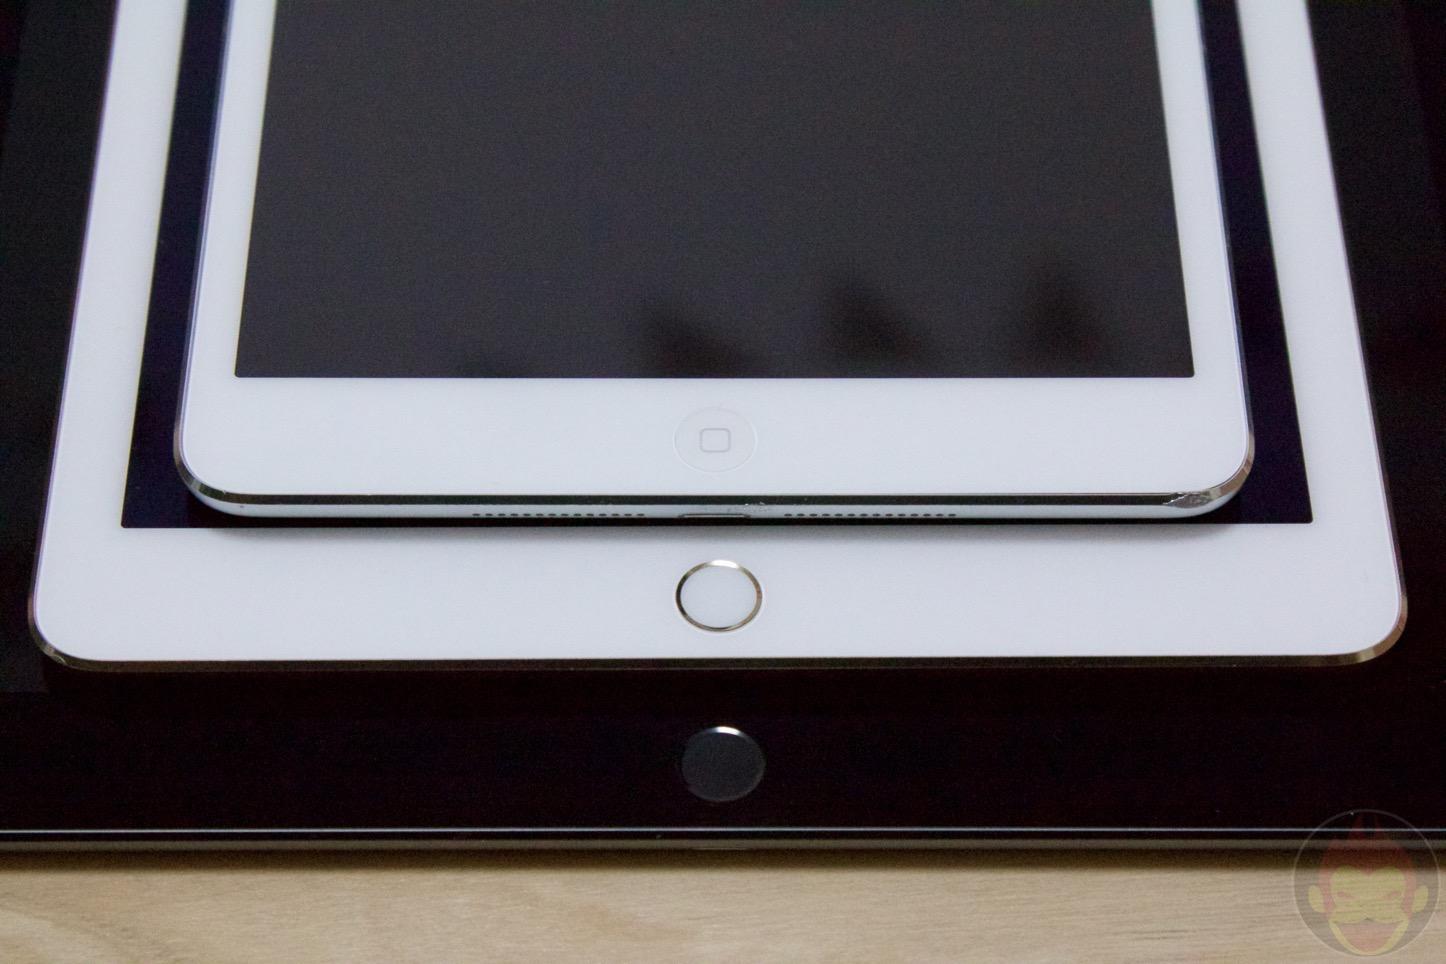 iPad-Pro-Air2-mini2-Comparison-01.jpg